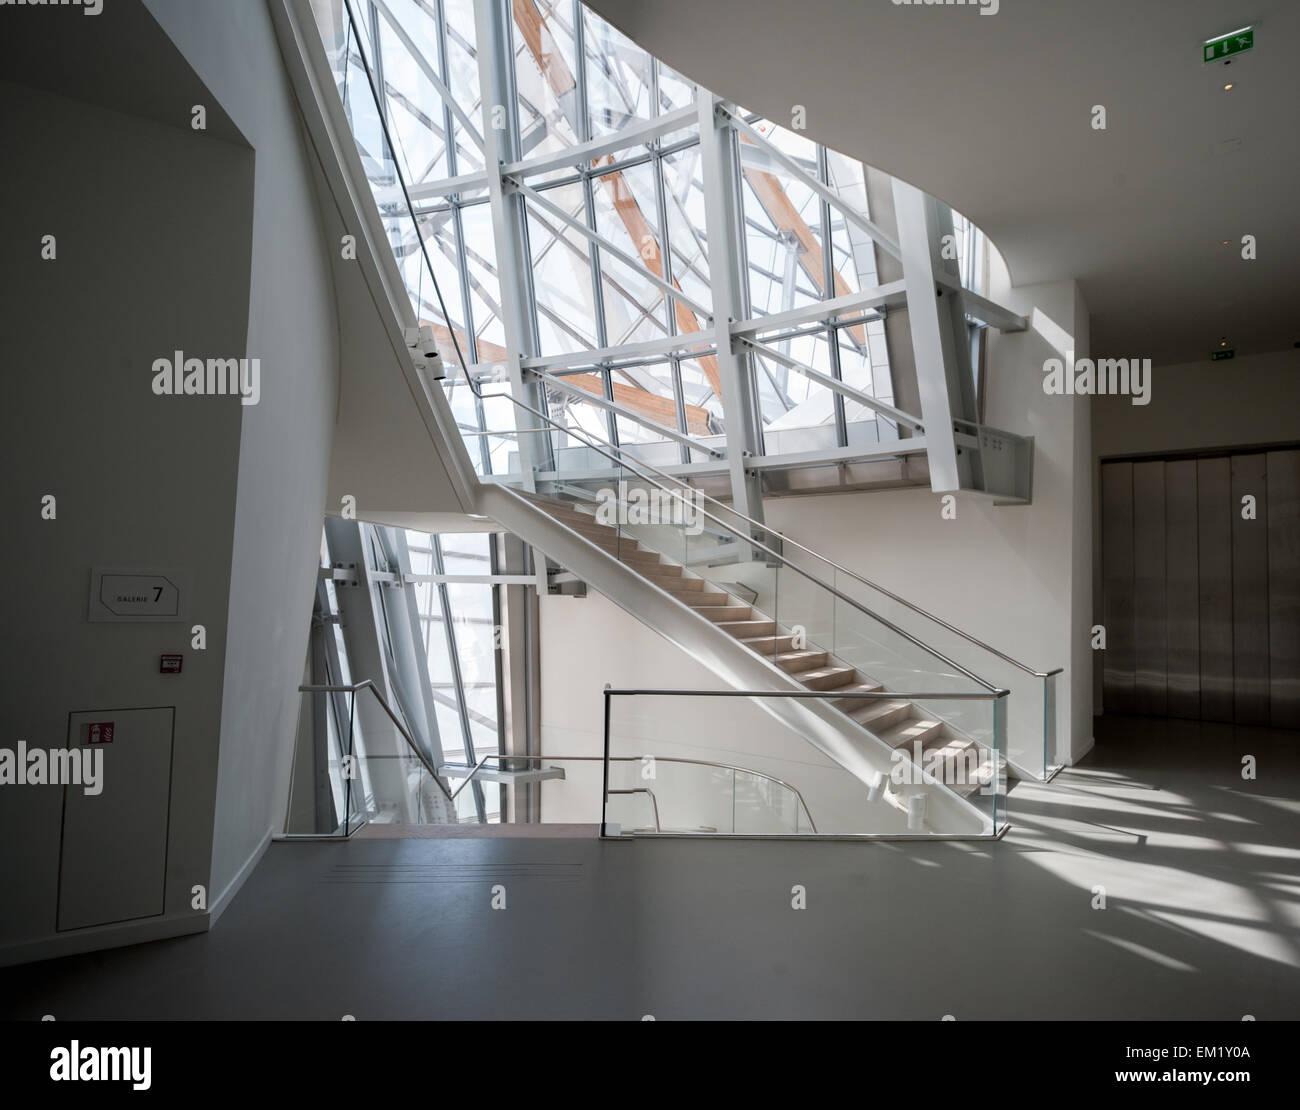 France, Paris, staircase of the Fondation Louis-Vuitton Stock Photo